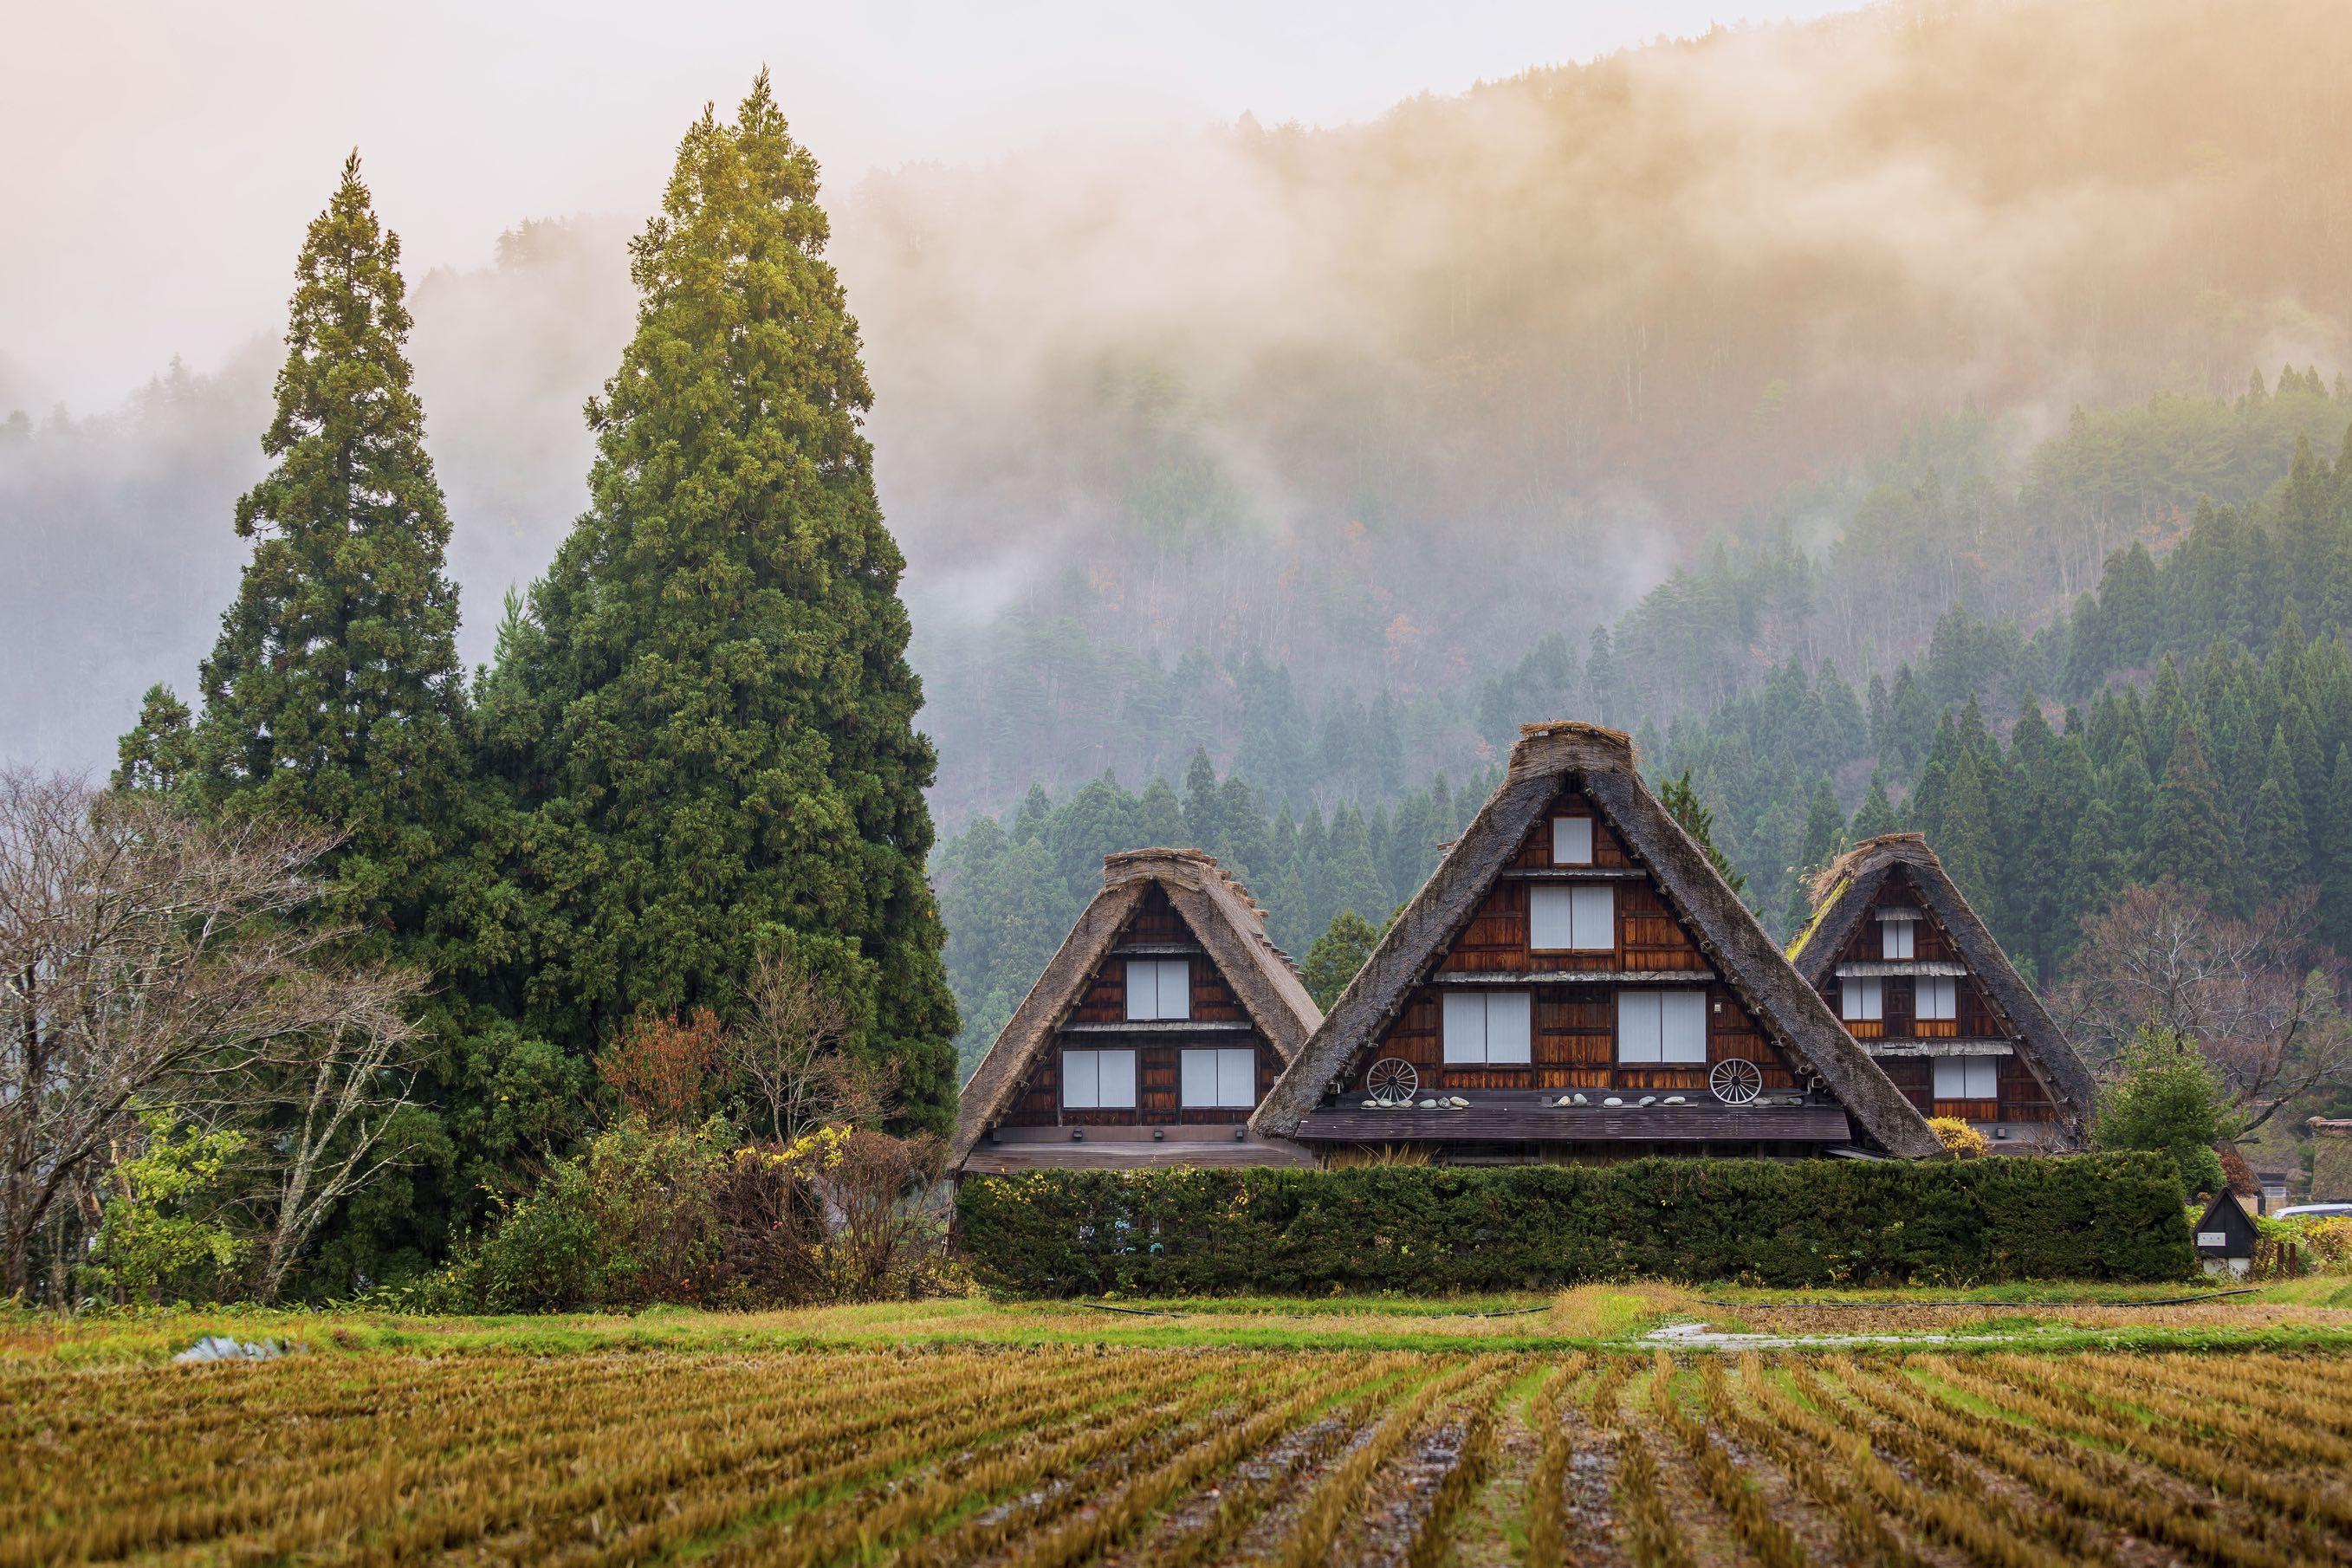 shirakawago and gokayama gaijinpot travel